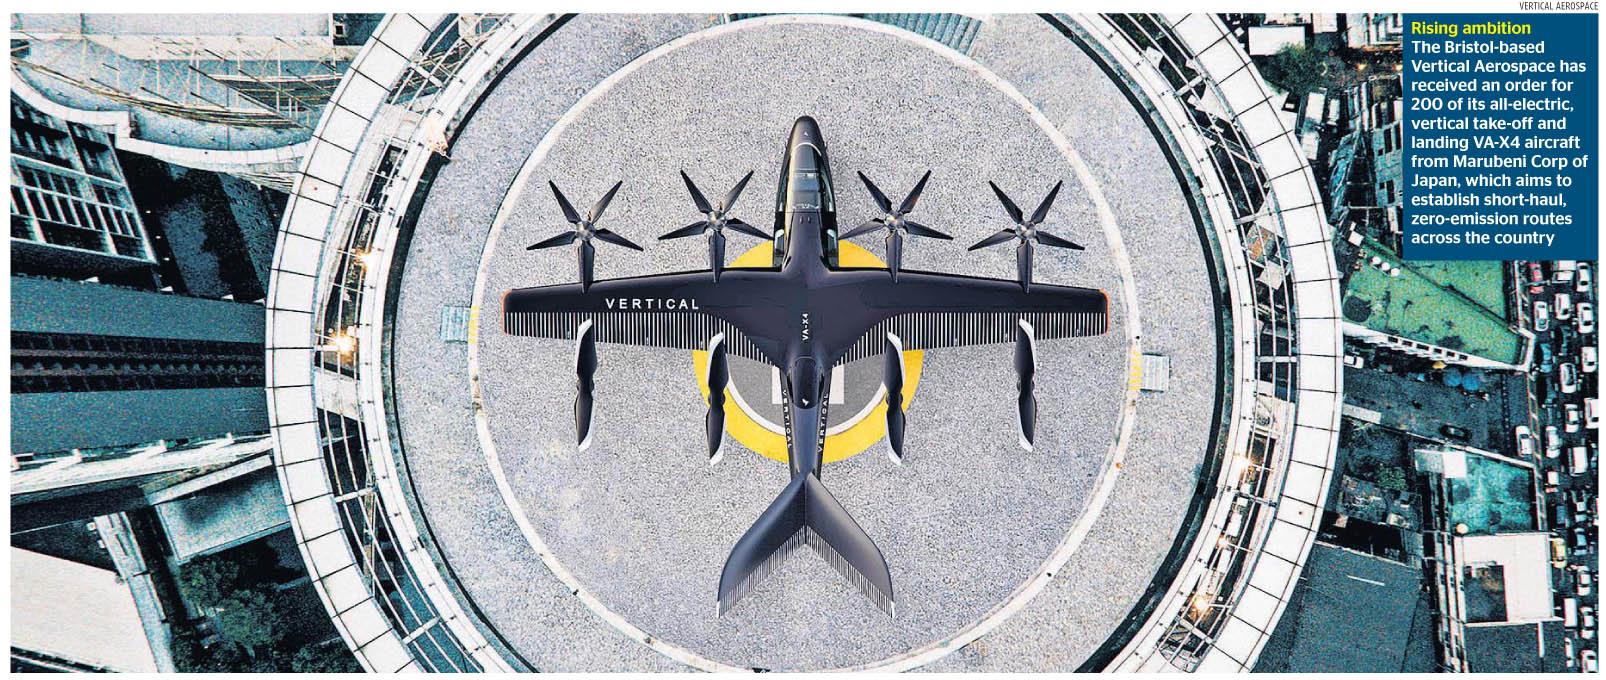 Times 210923 Vertical Aerospace.jpg